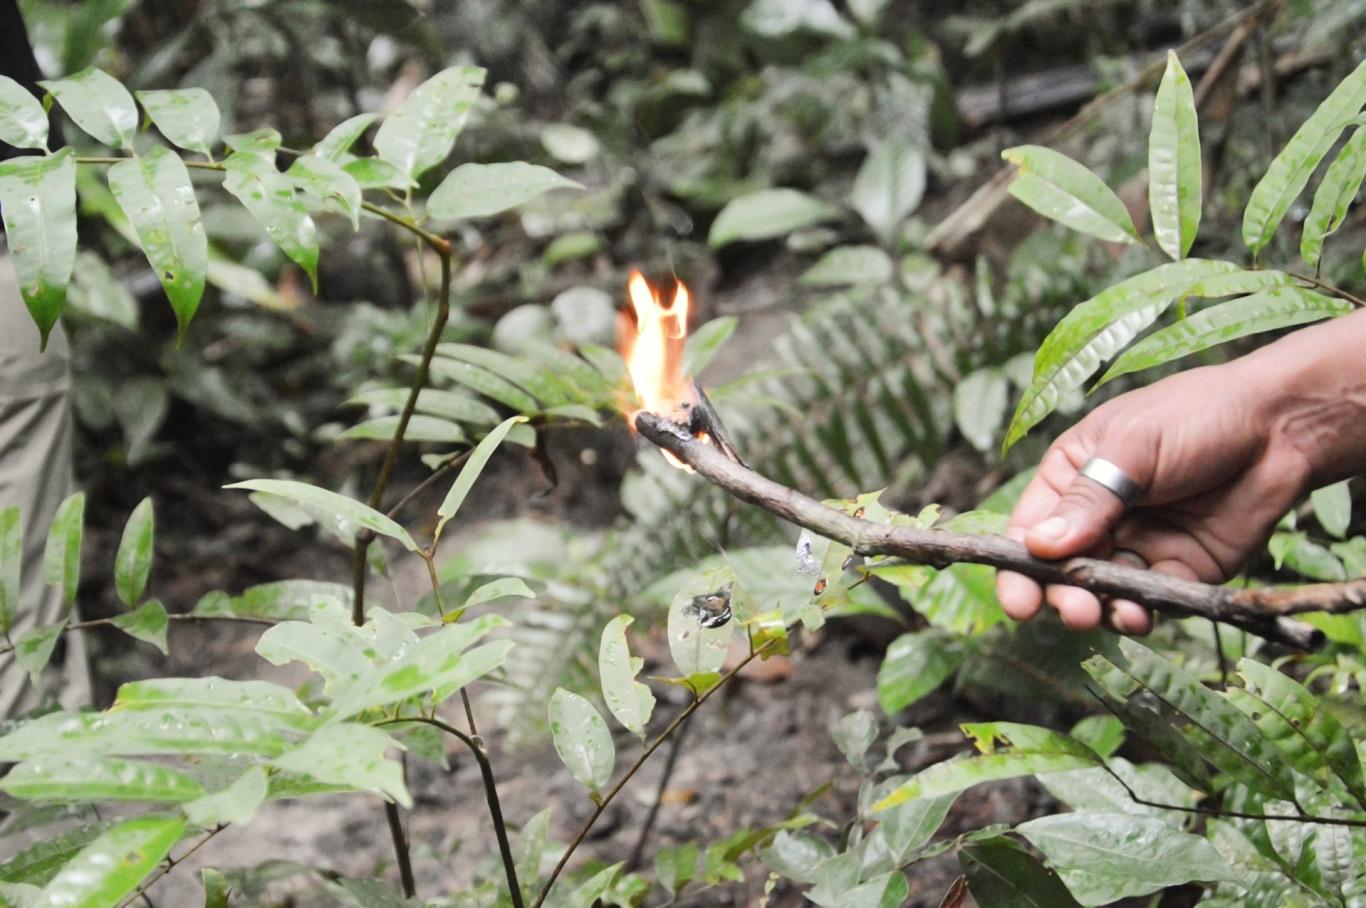 Flammable sap